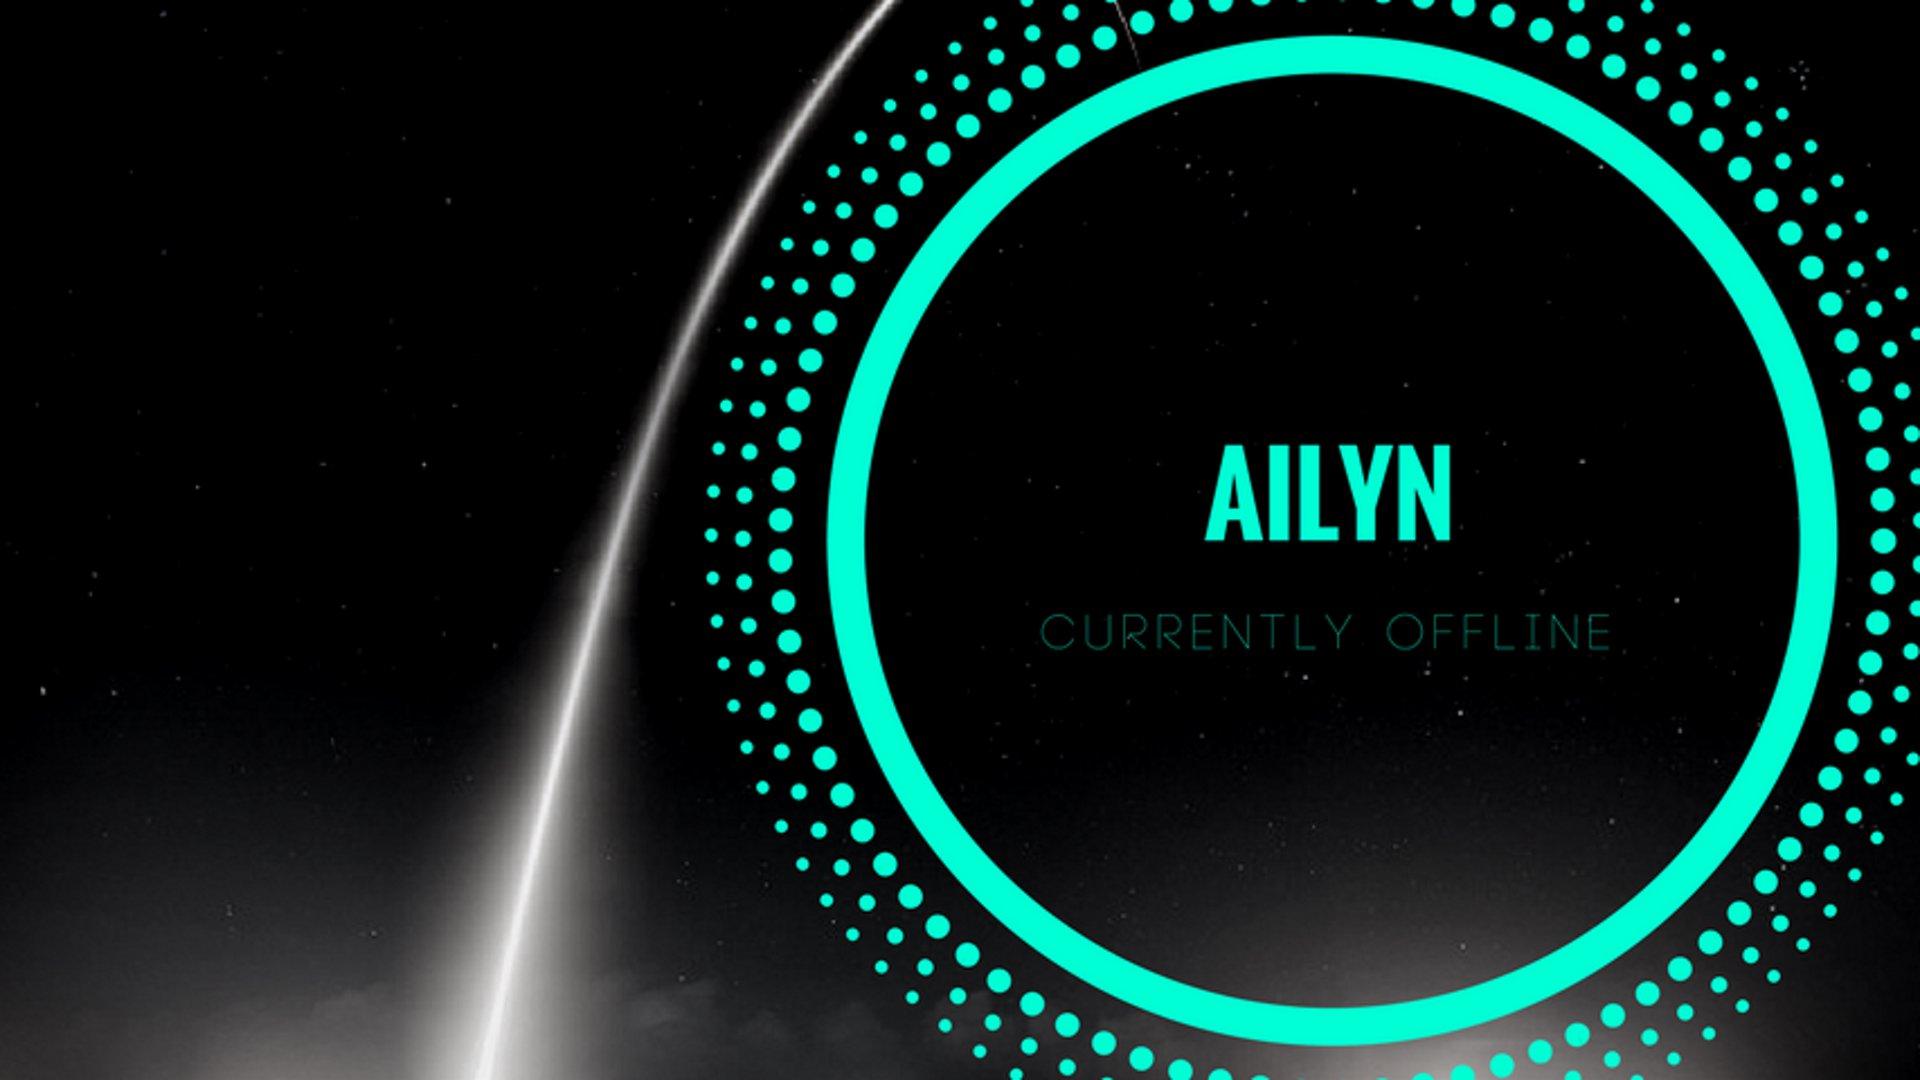 Ailyn94